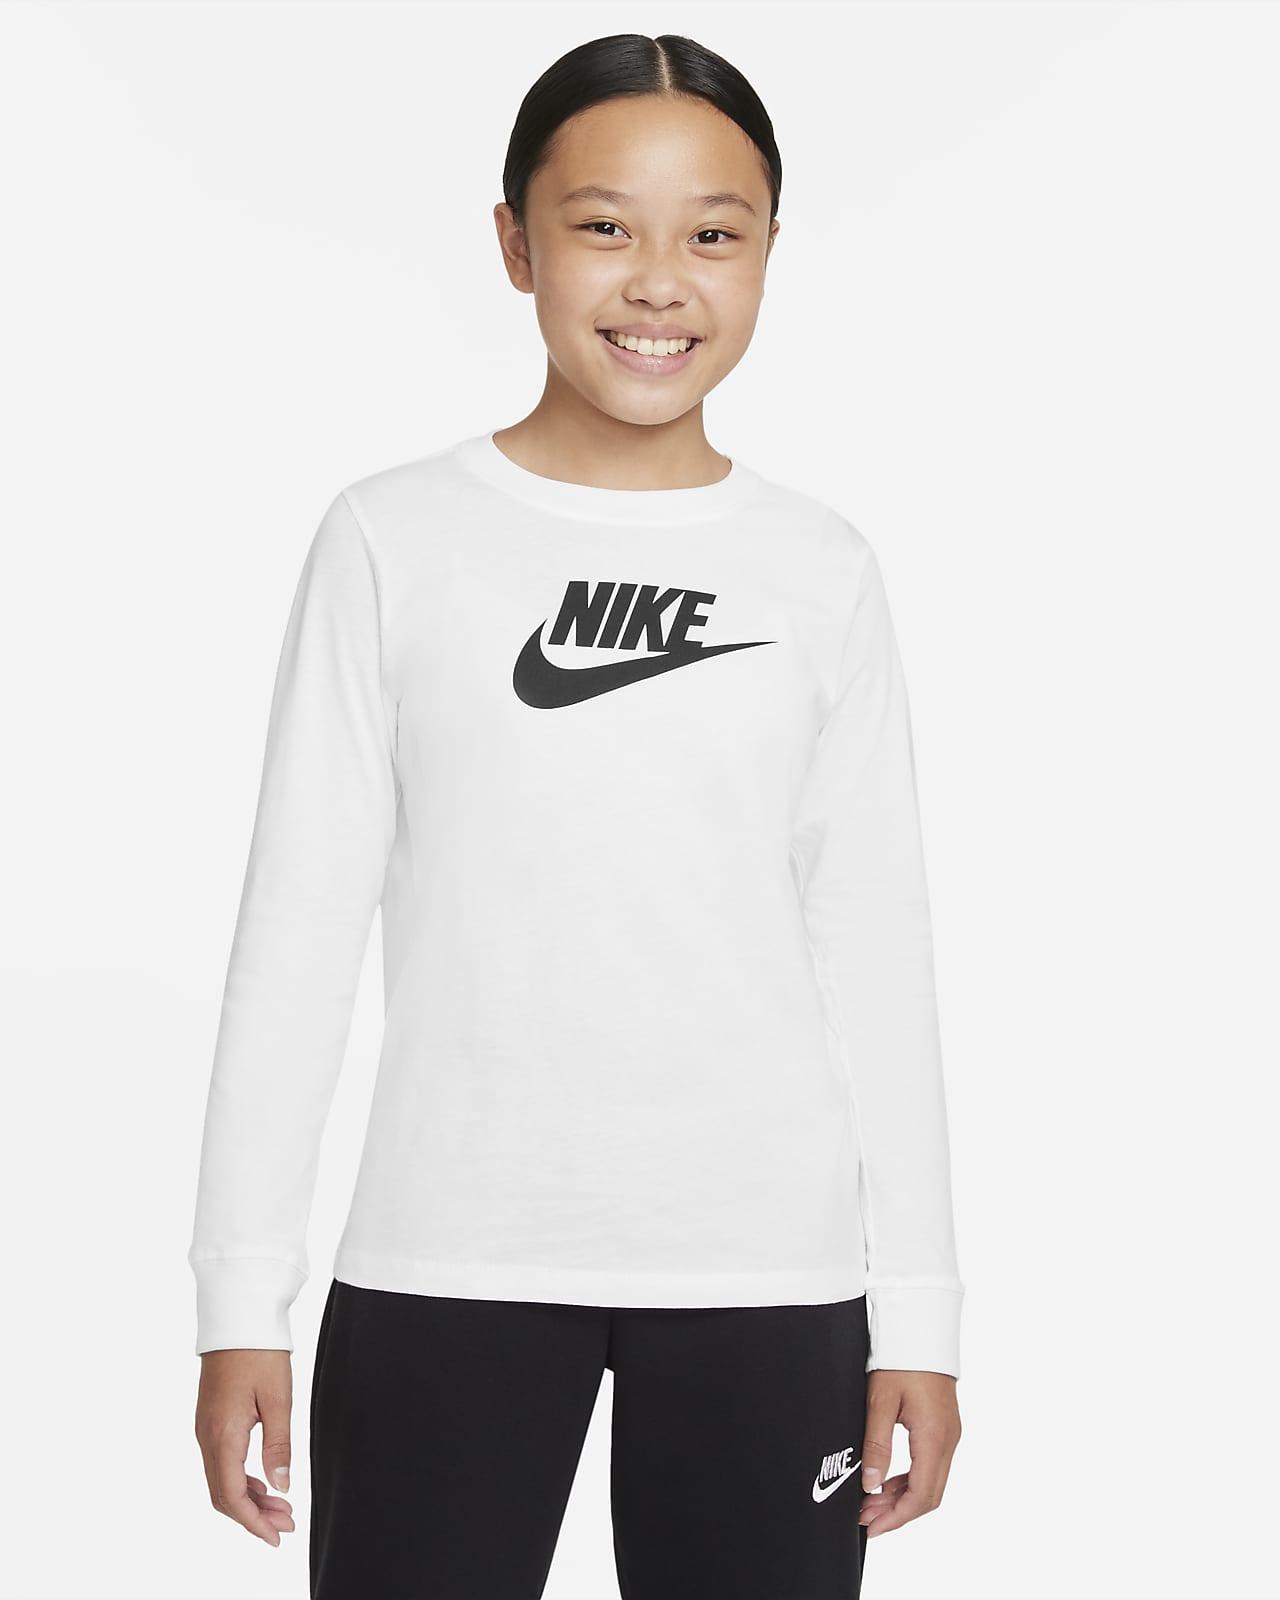 Camisola de manga comprida Nike Sportswear Júnior (Rapariga)